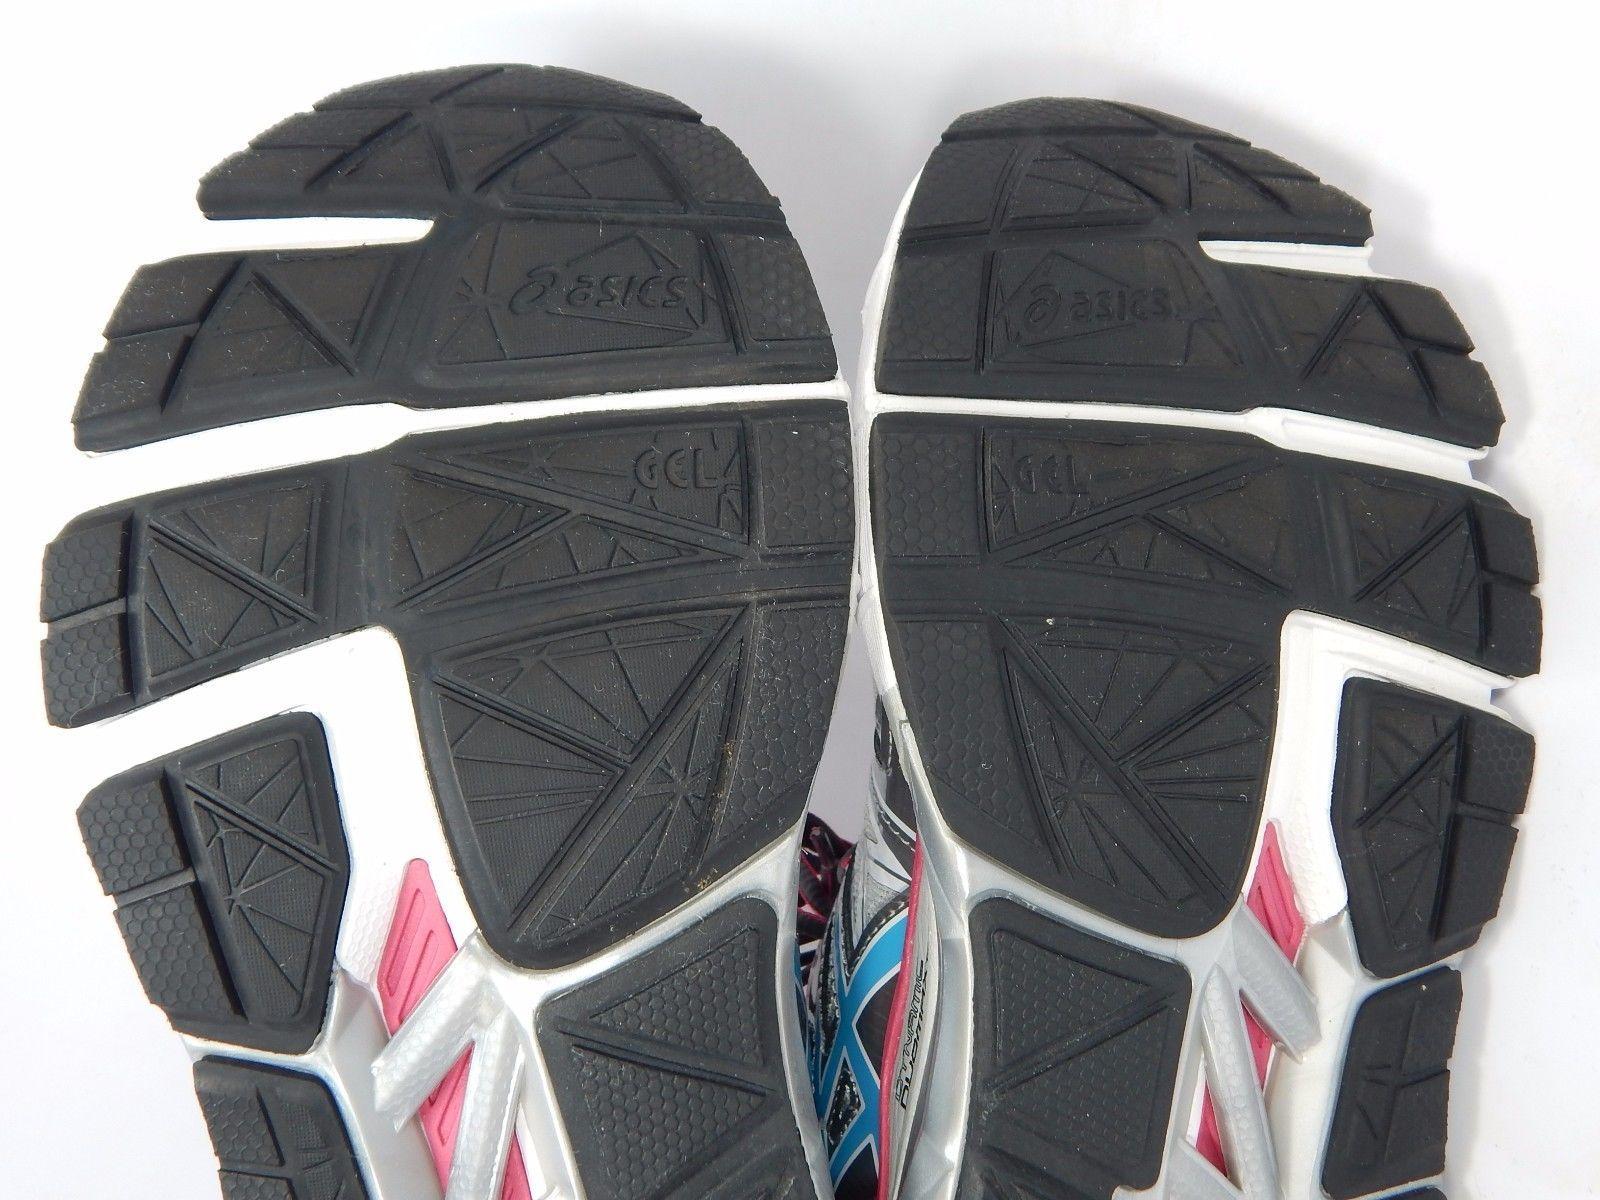 Asics Gel Fortify Women's Running Shoes Size US 7 M (B) EU 38 Silver T571N